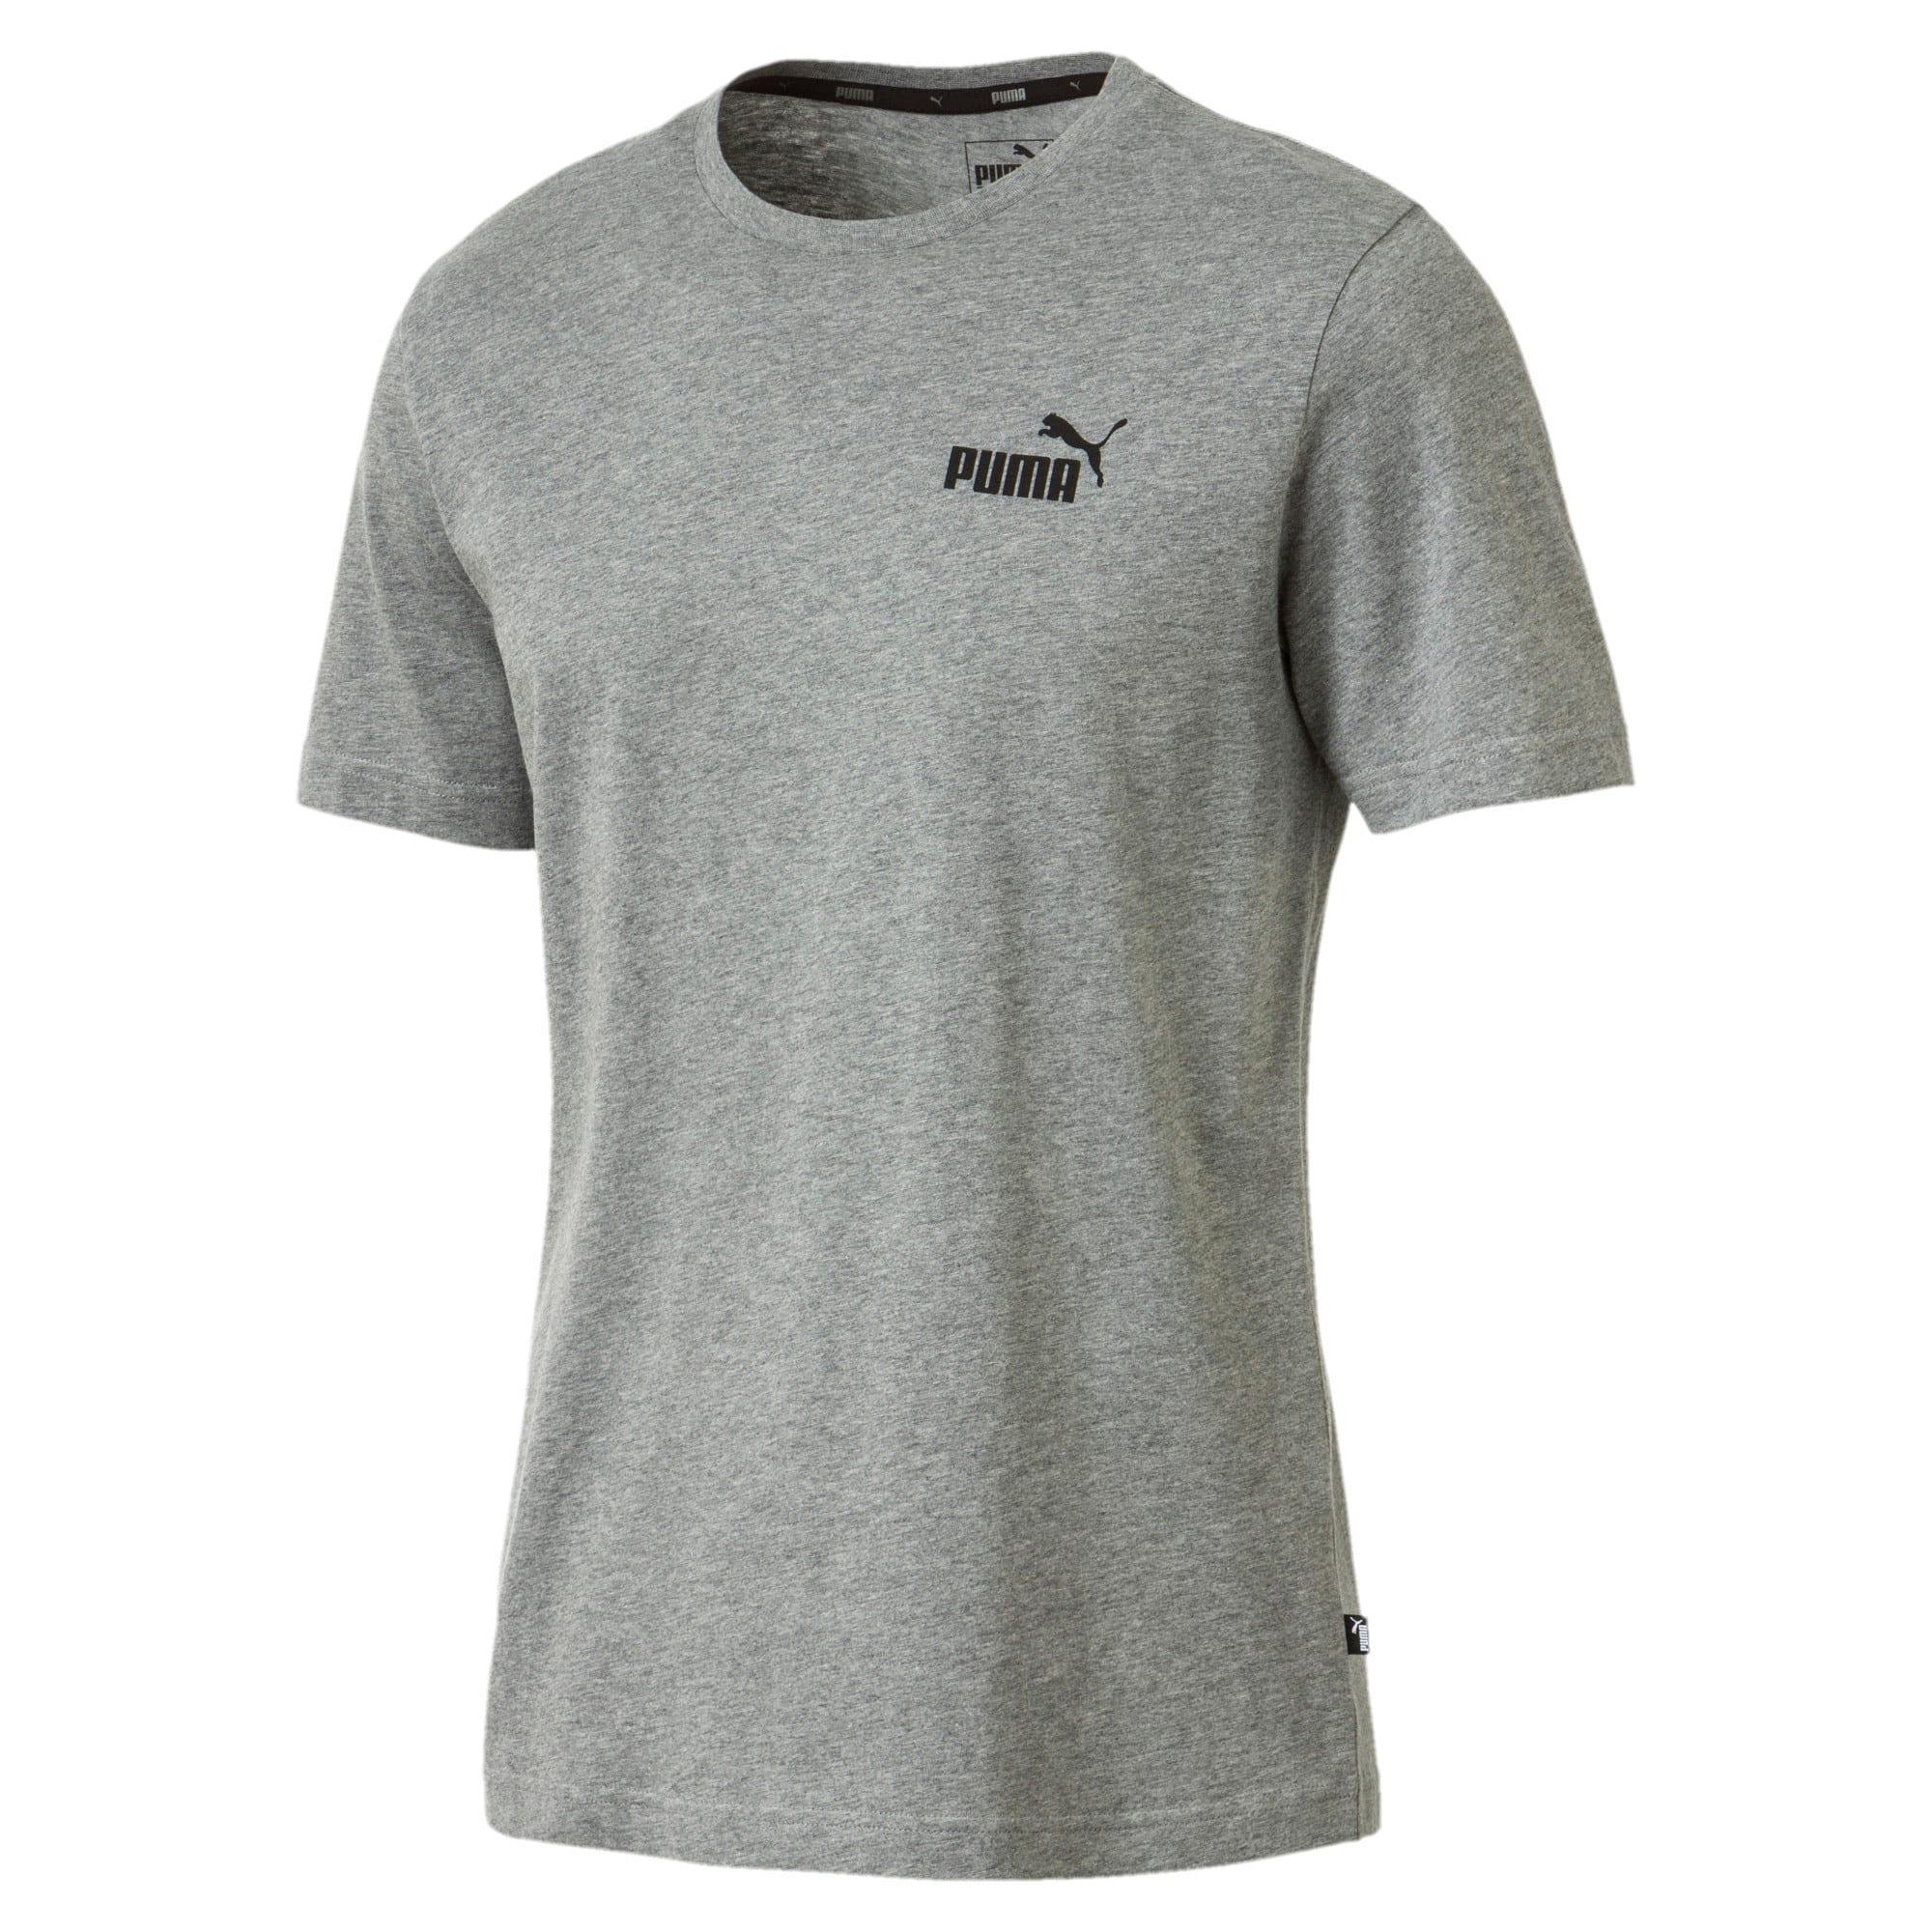 Thumbnail 1 of T-shirt con logo piccolo Essentials uomo, Medium Gray Heather, medium